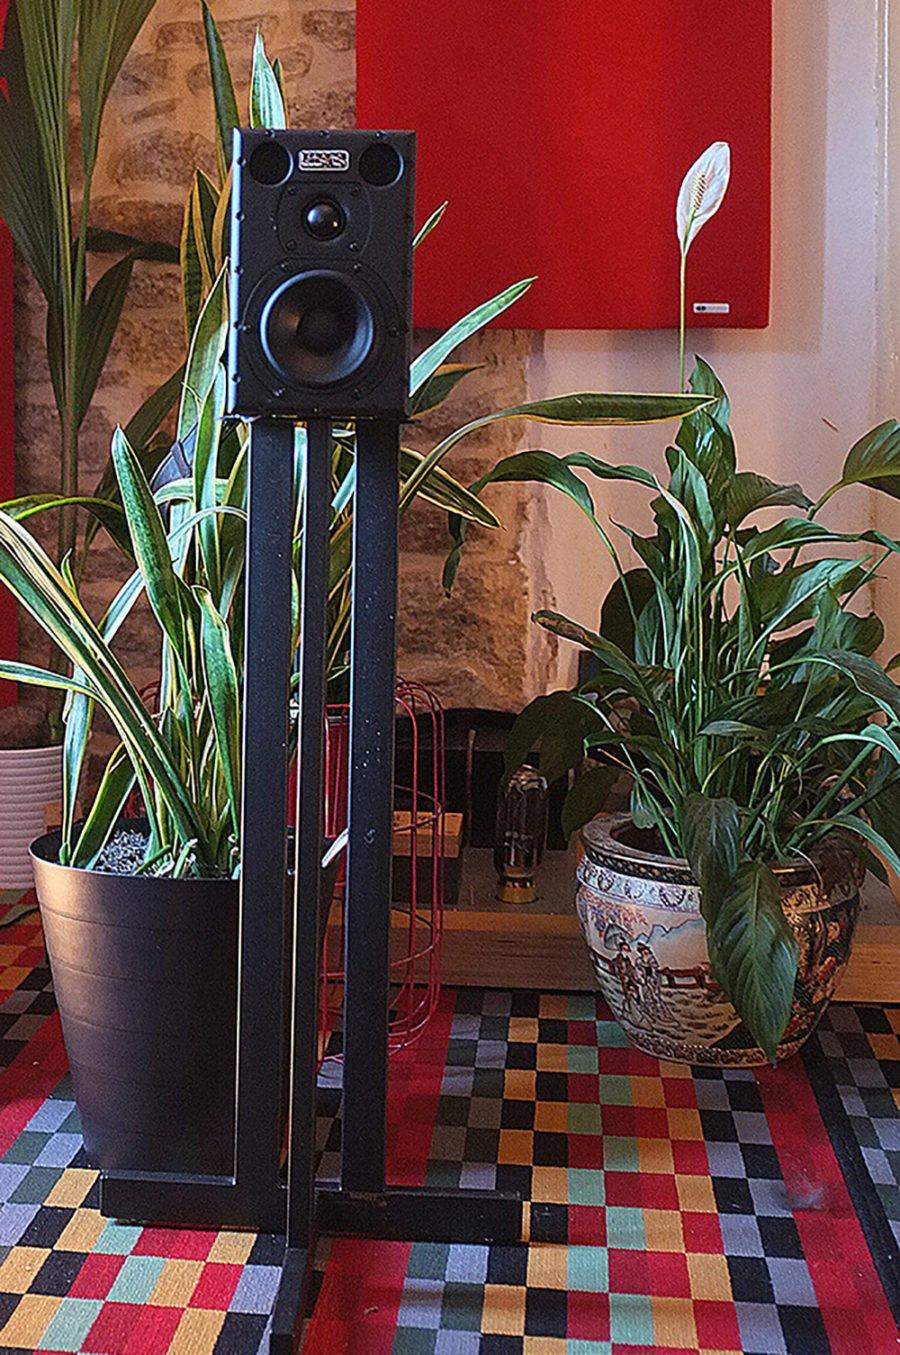 Leema Xen Loudspeaker Review